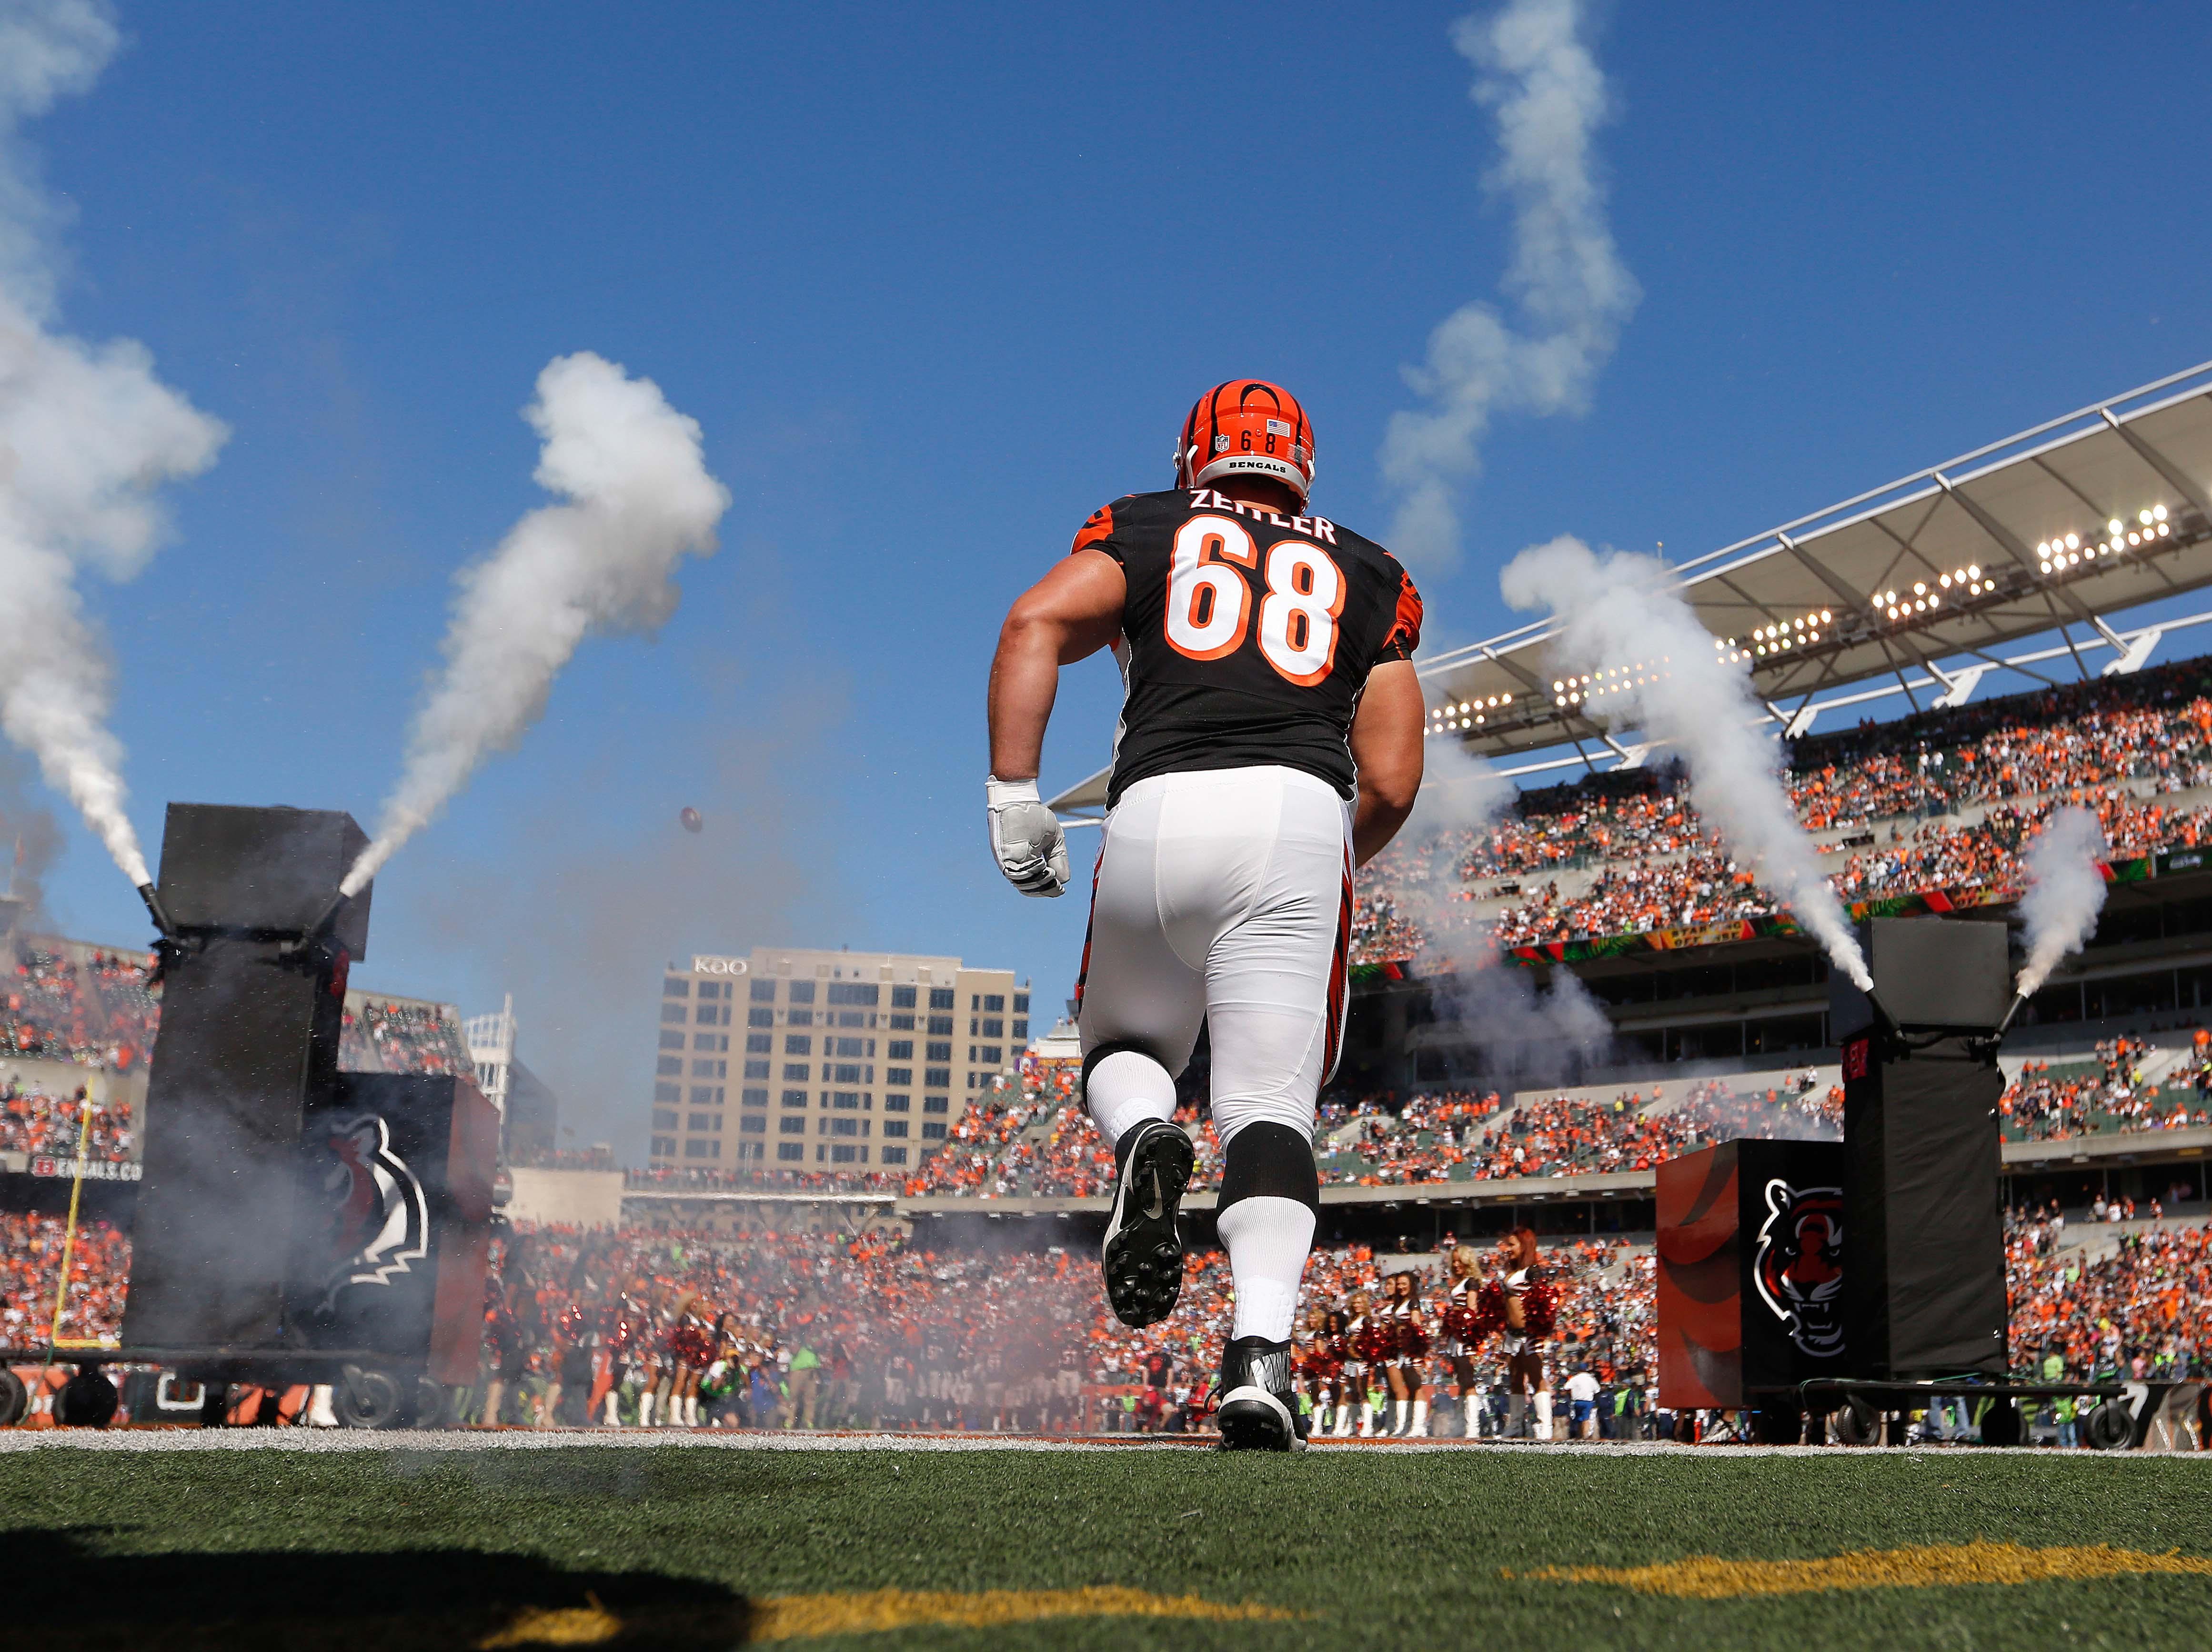 NFL: Seattle Seahawks at Cincinnati Bengals